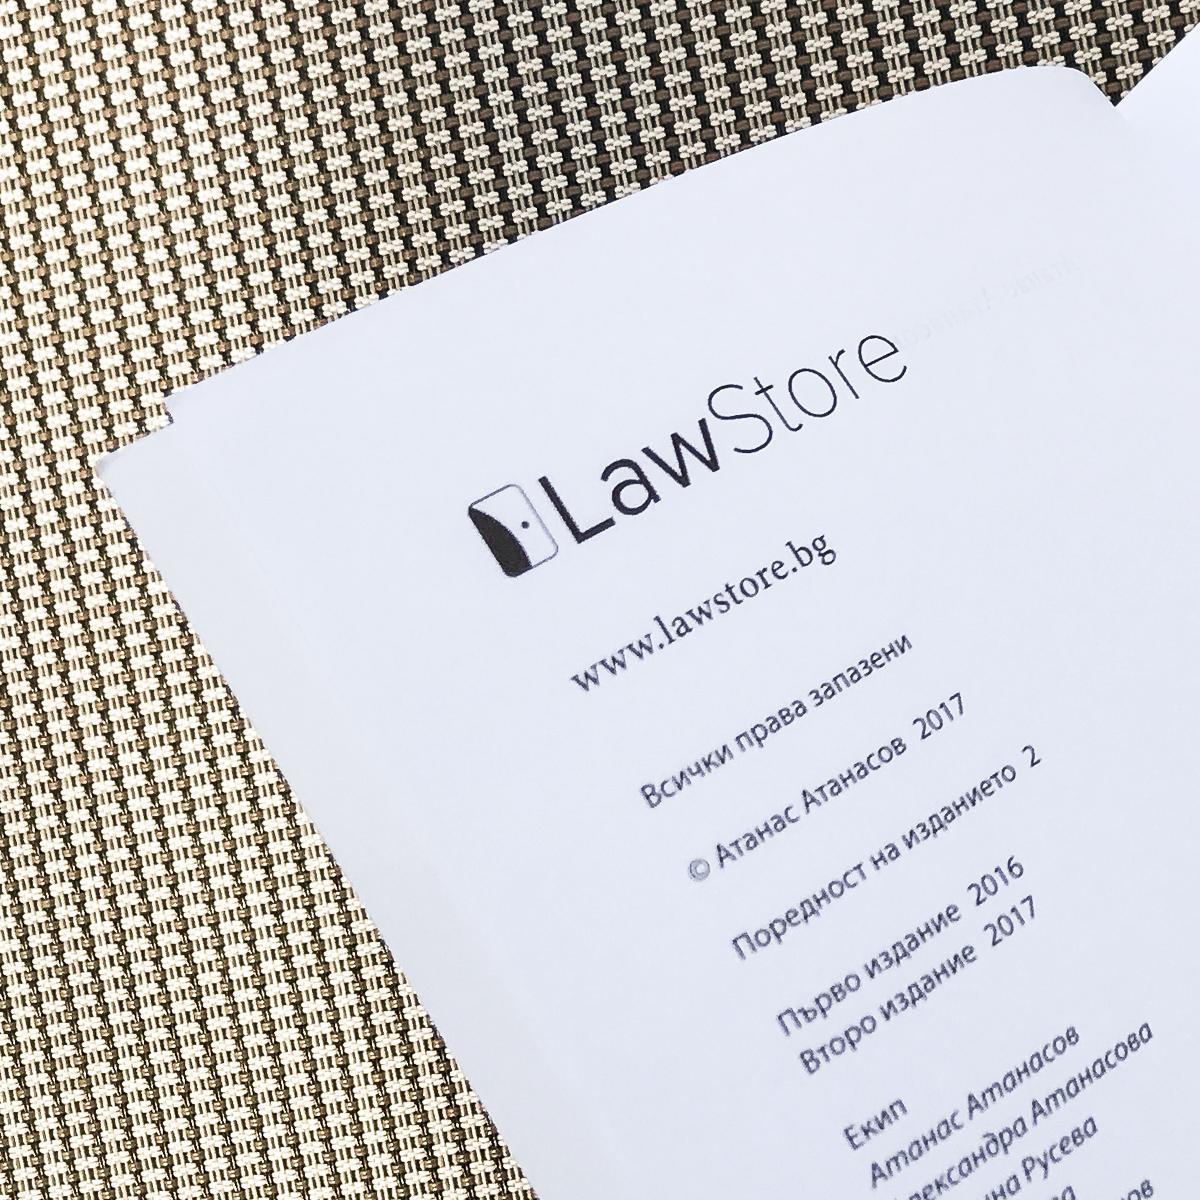 Юридическа правоспособност